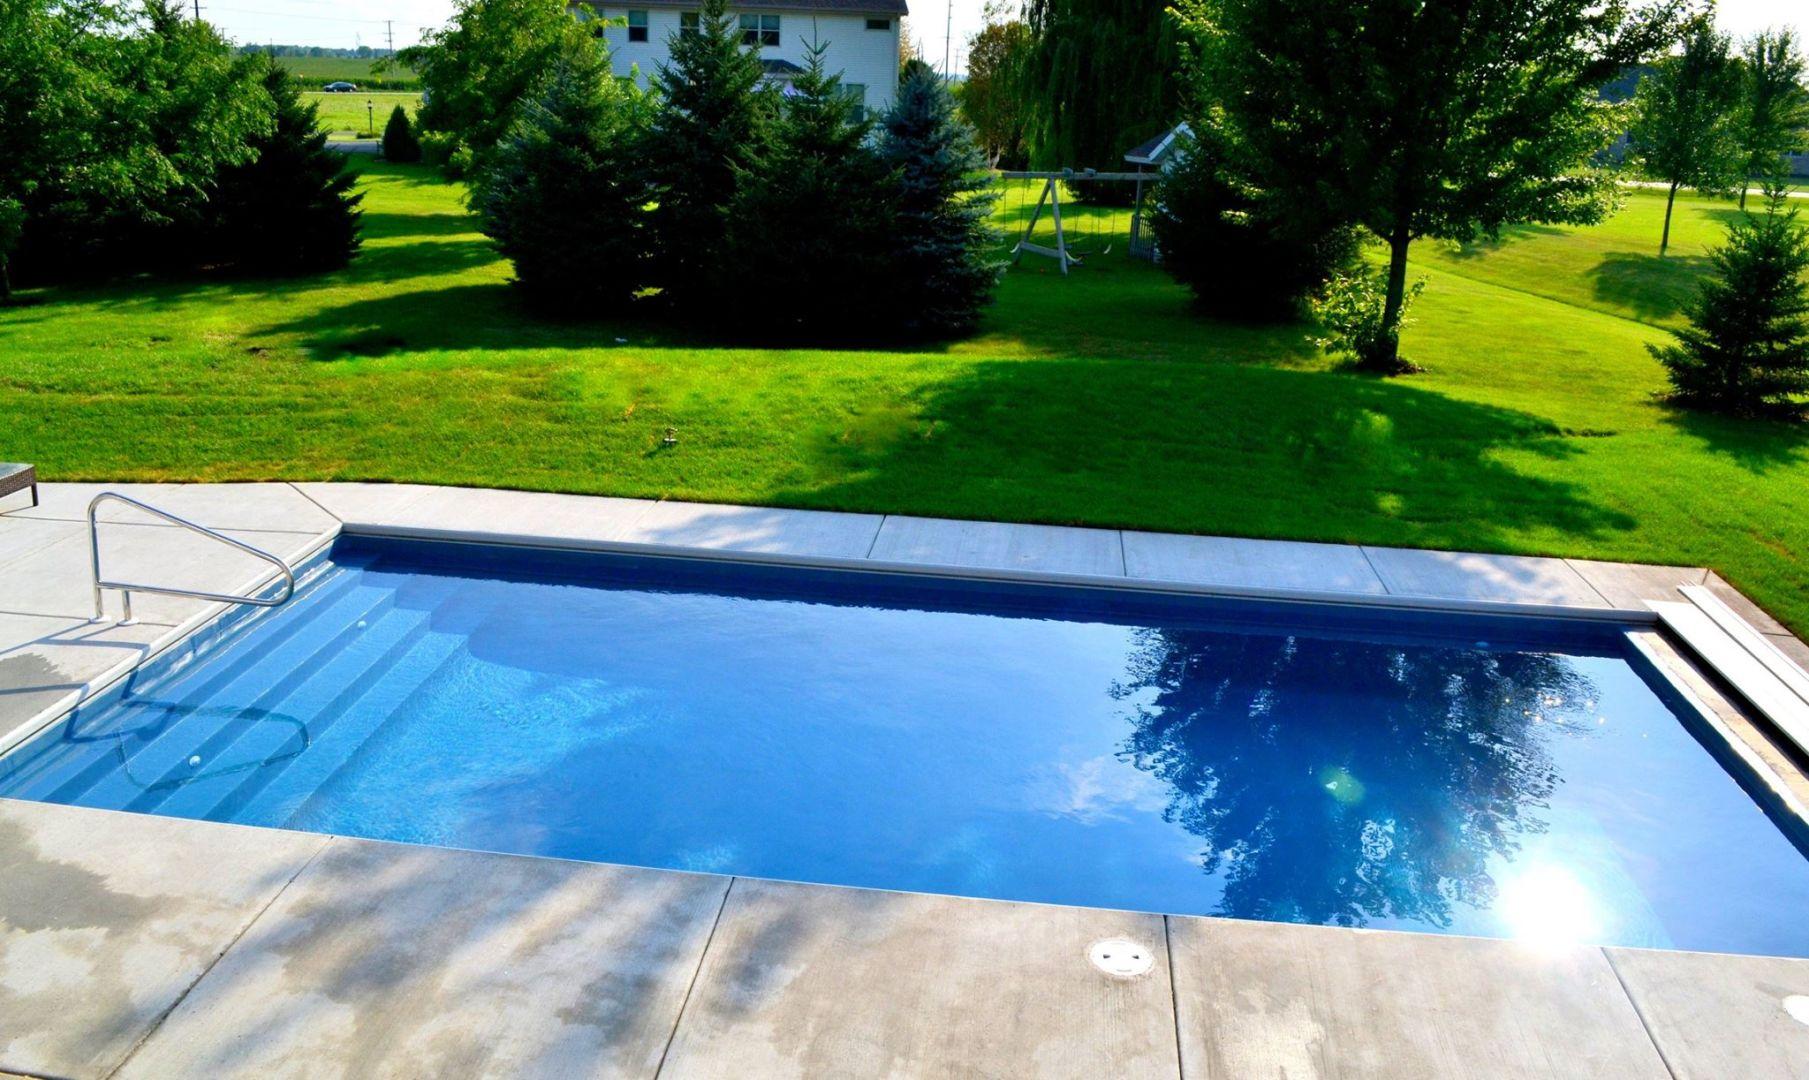 Zenith Inground Fiberglass Pool By Trilogy Patio Pleasures